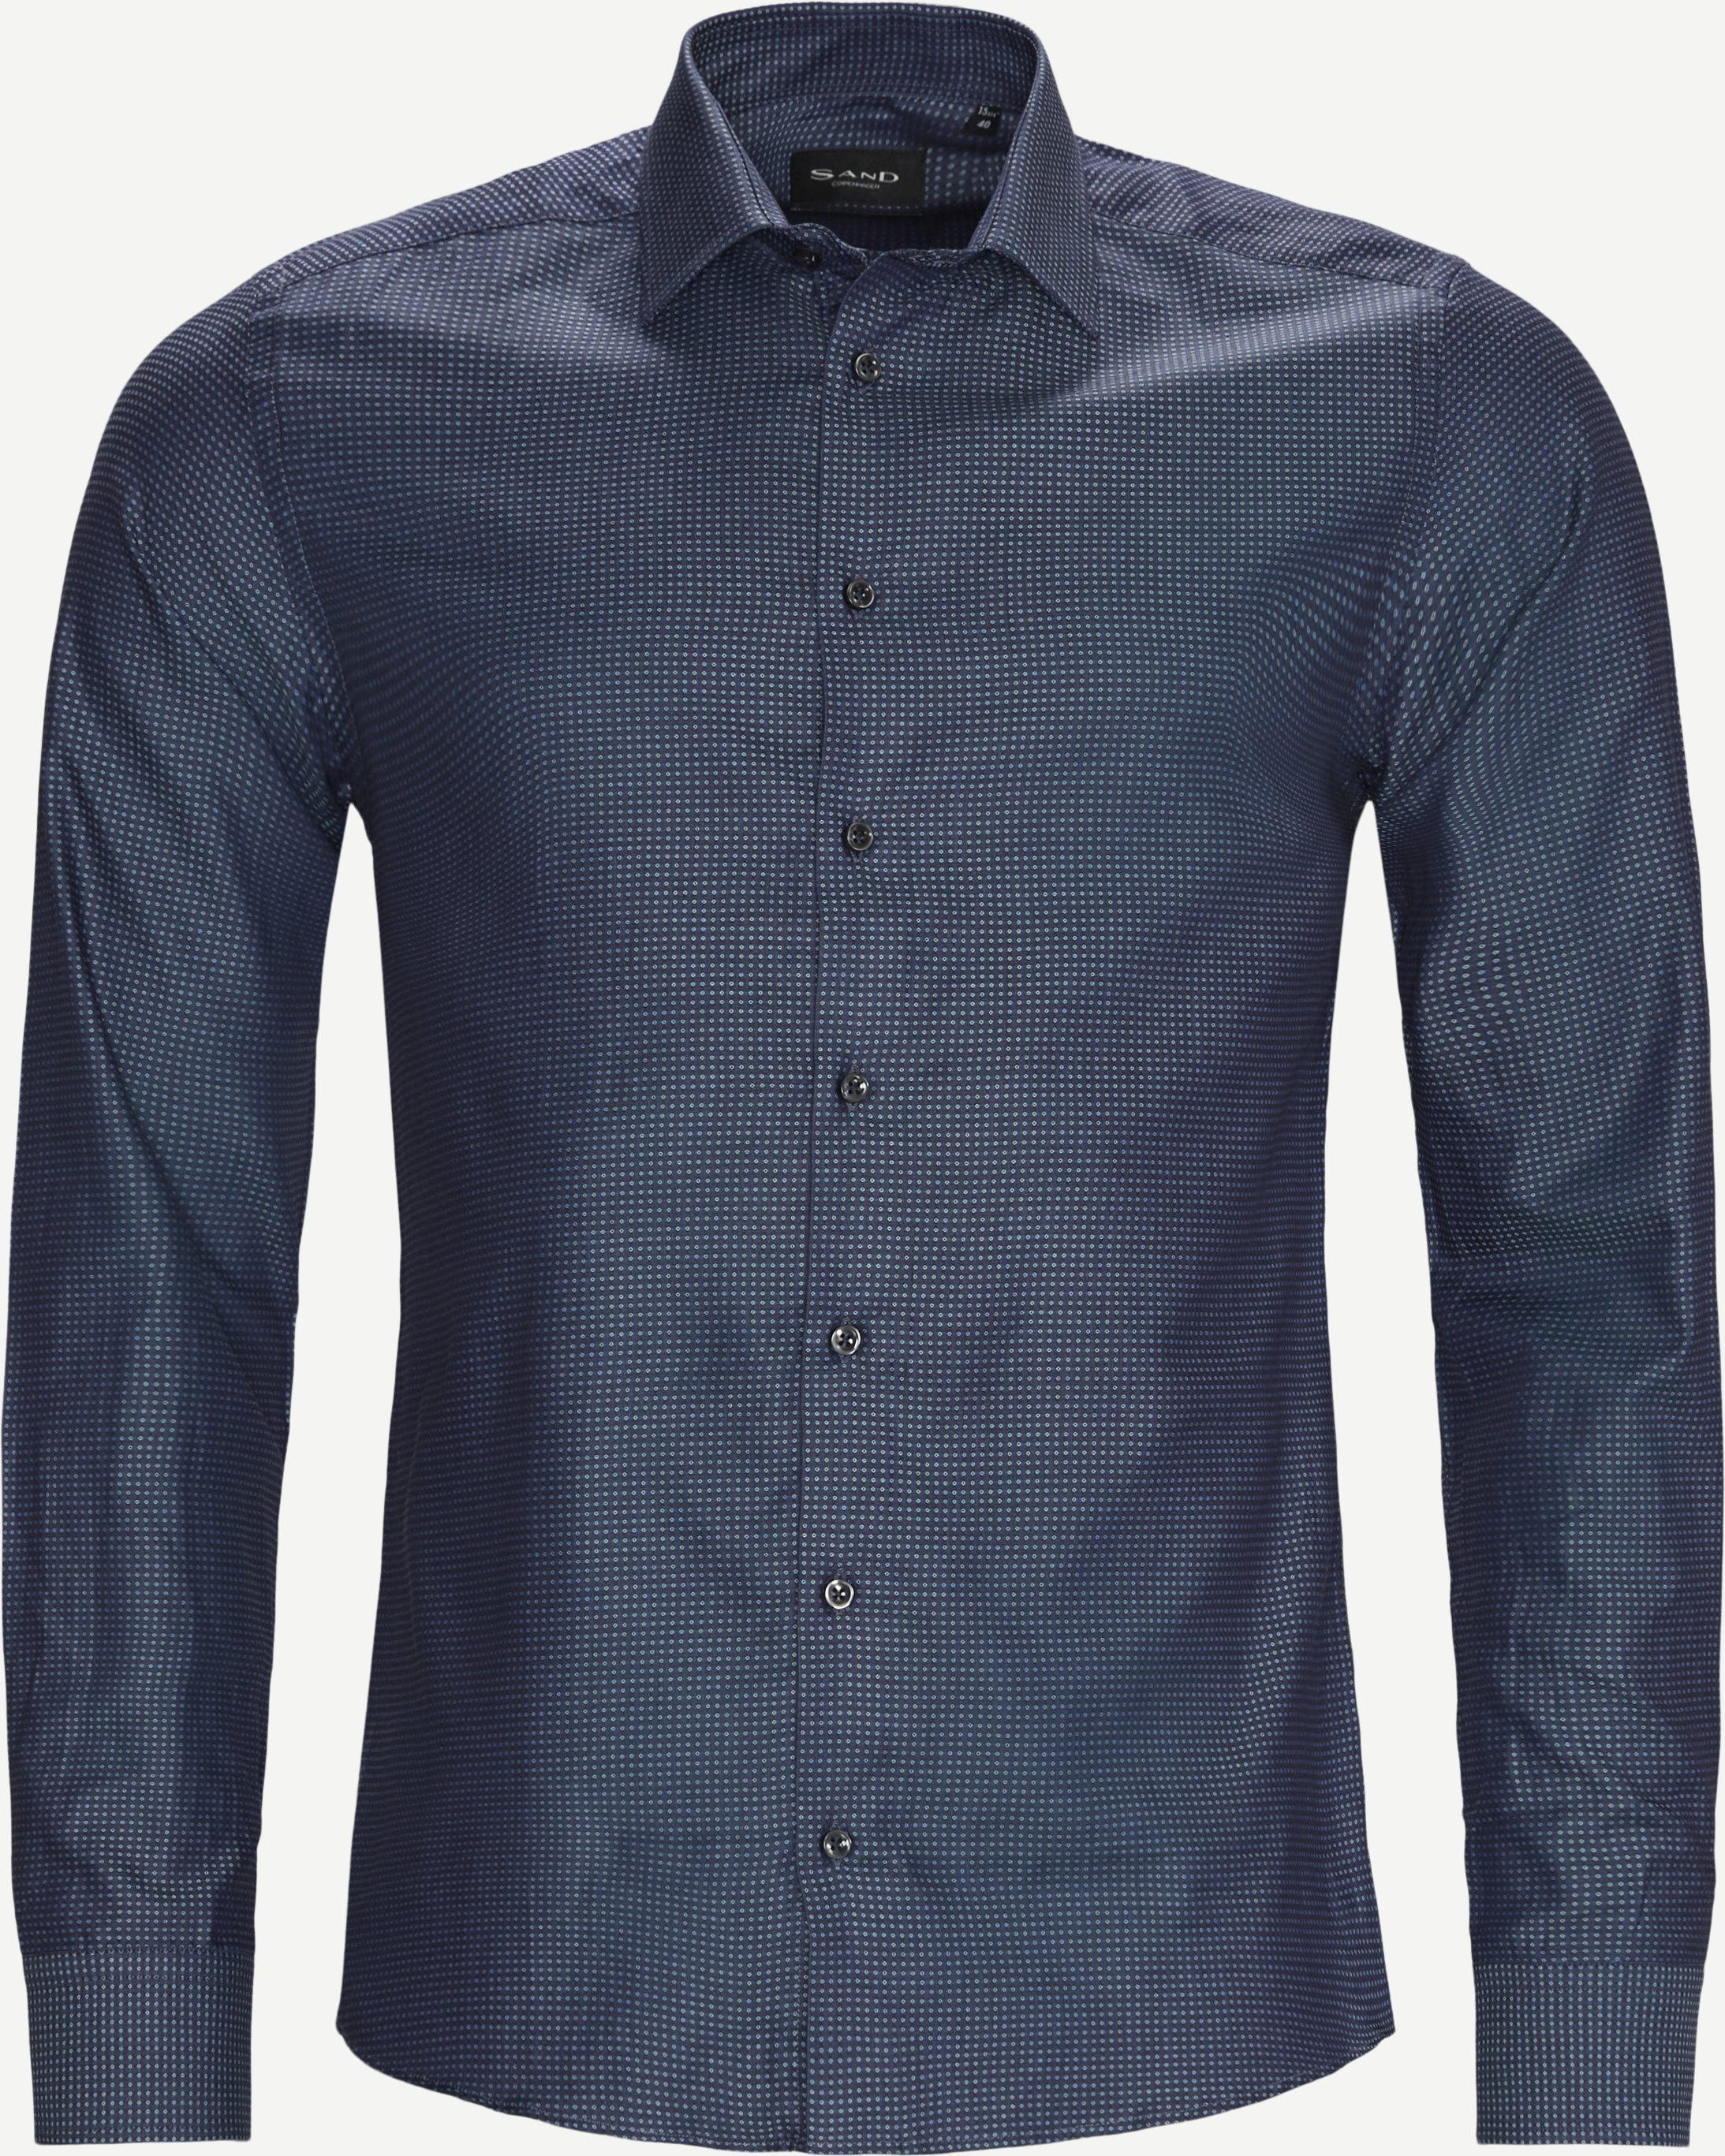 8650 Iver 2/State N 2 Shirt - Skjortor - Blå